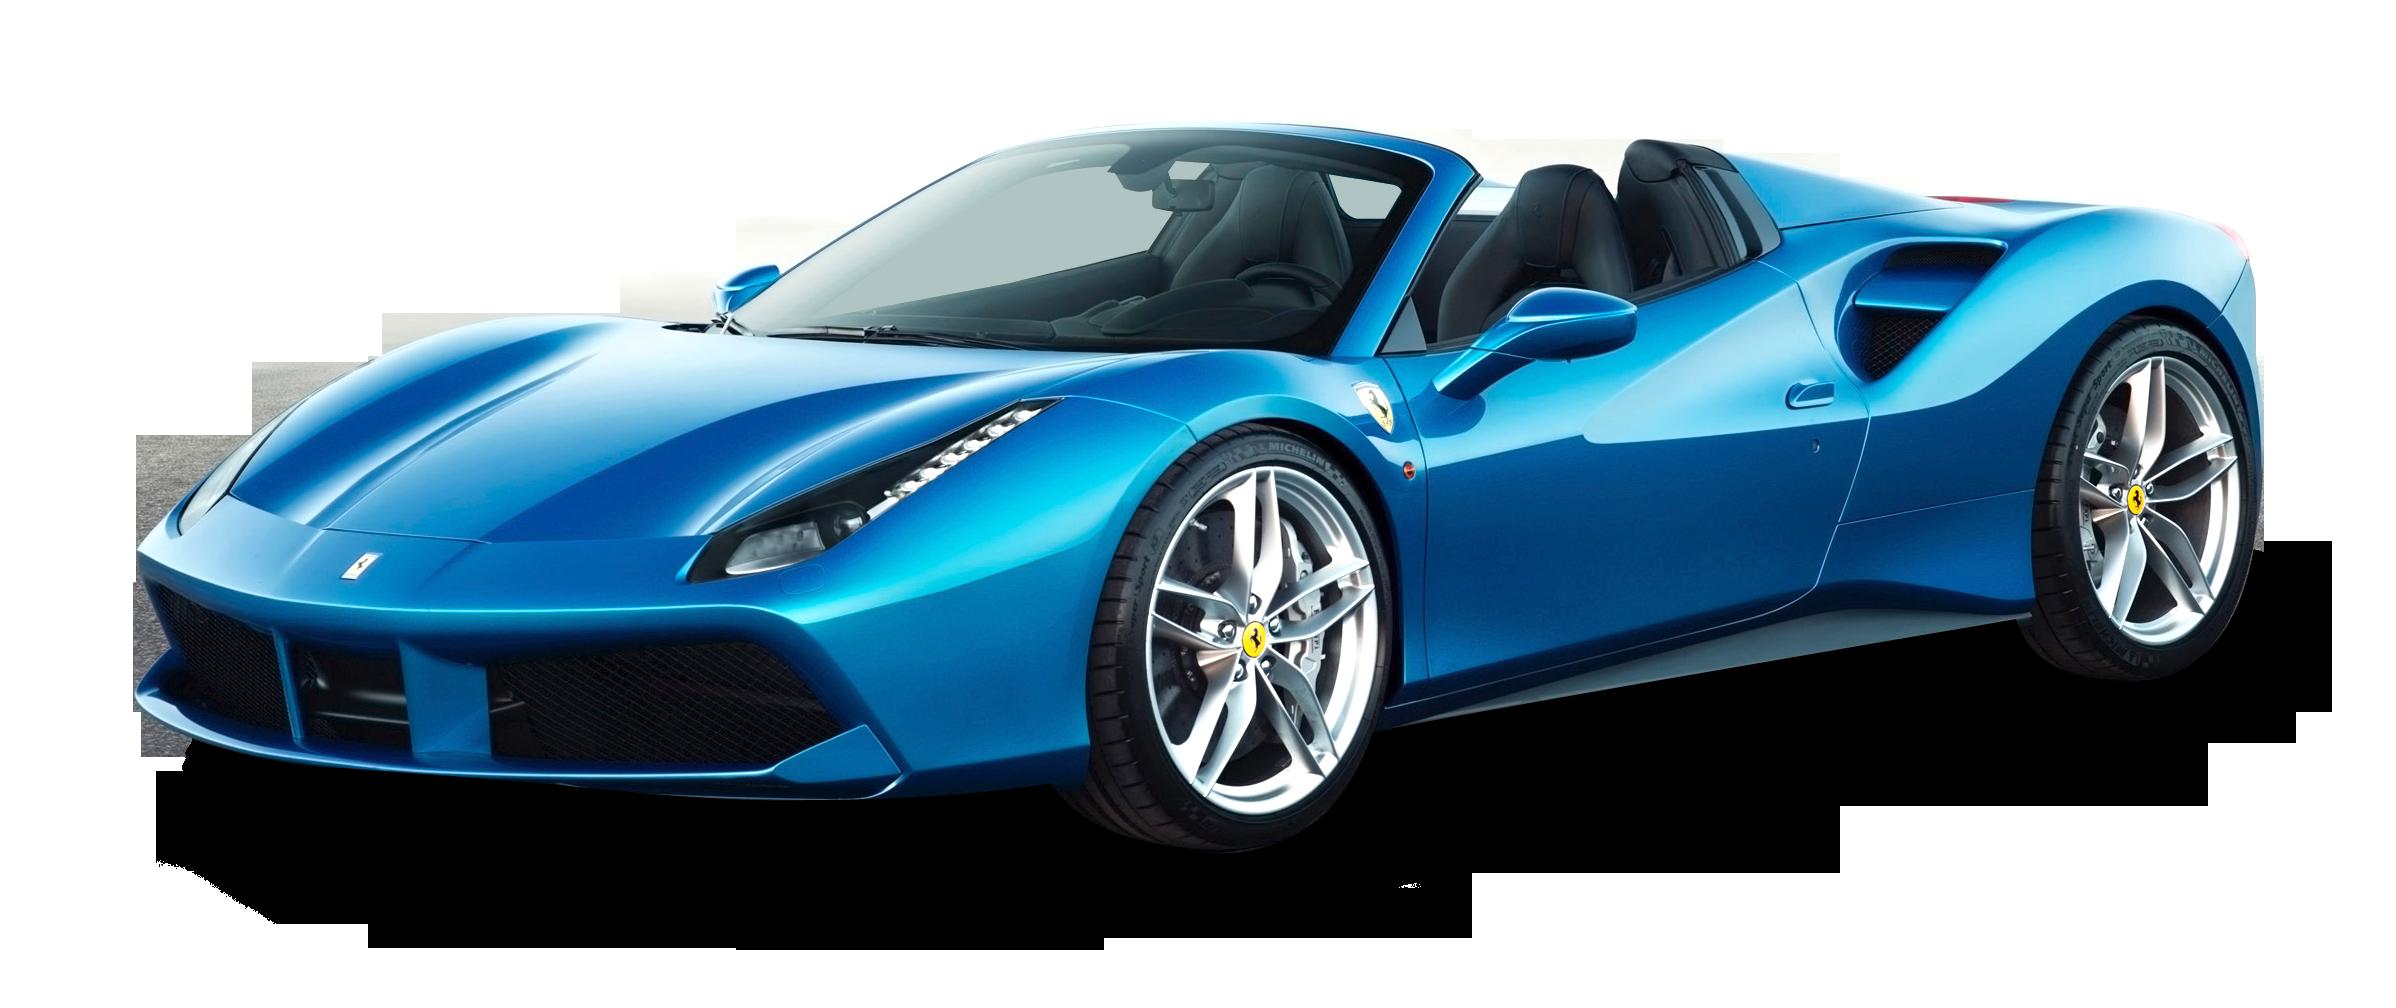 Blue Ferrari 488 Spider Car